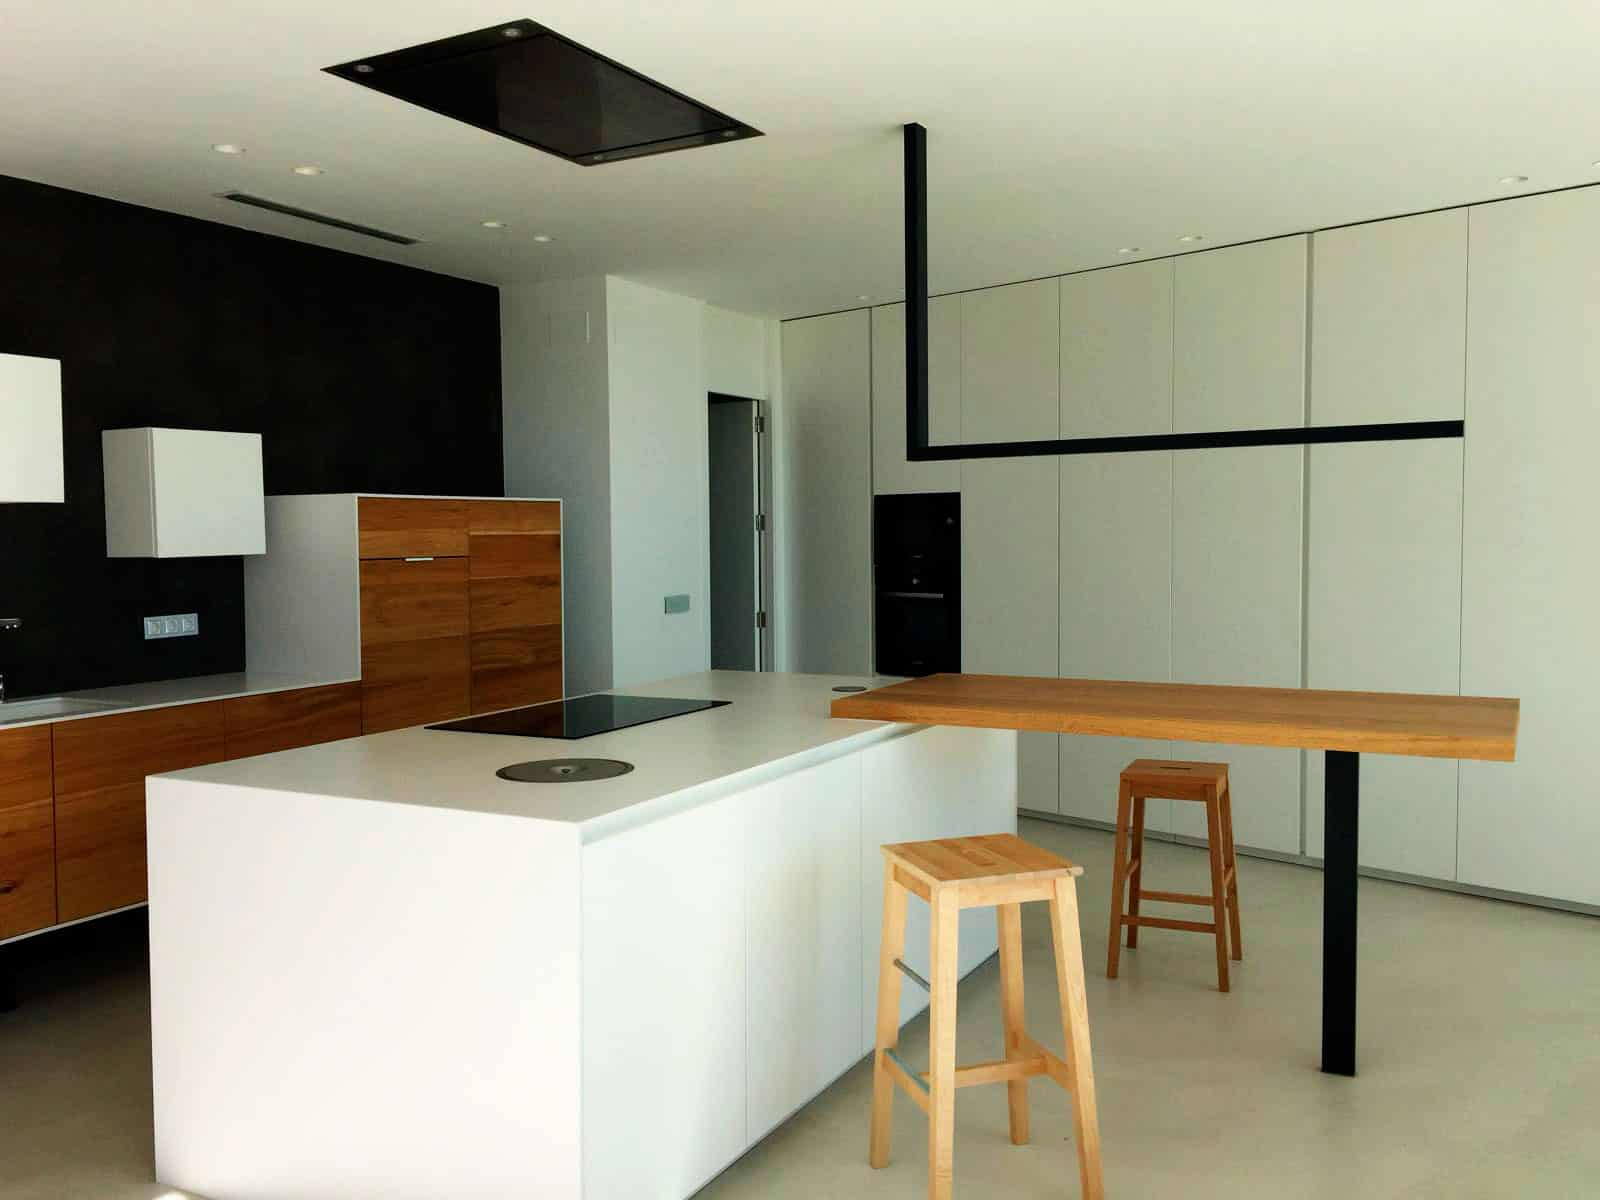 casa oropesa 5